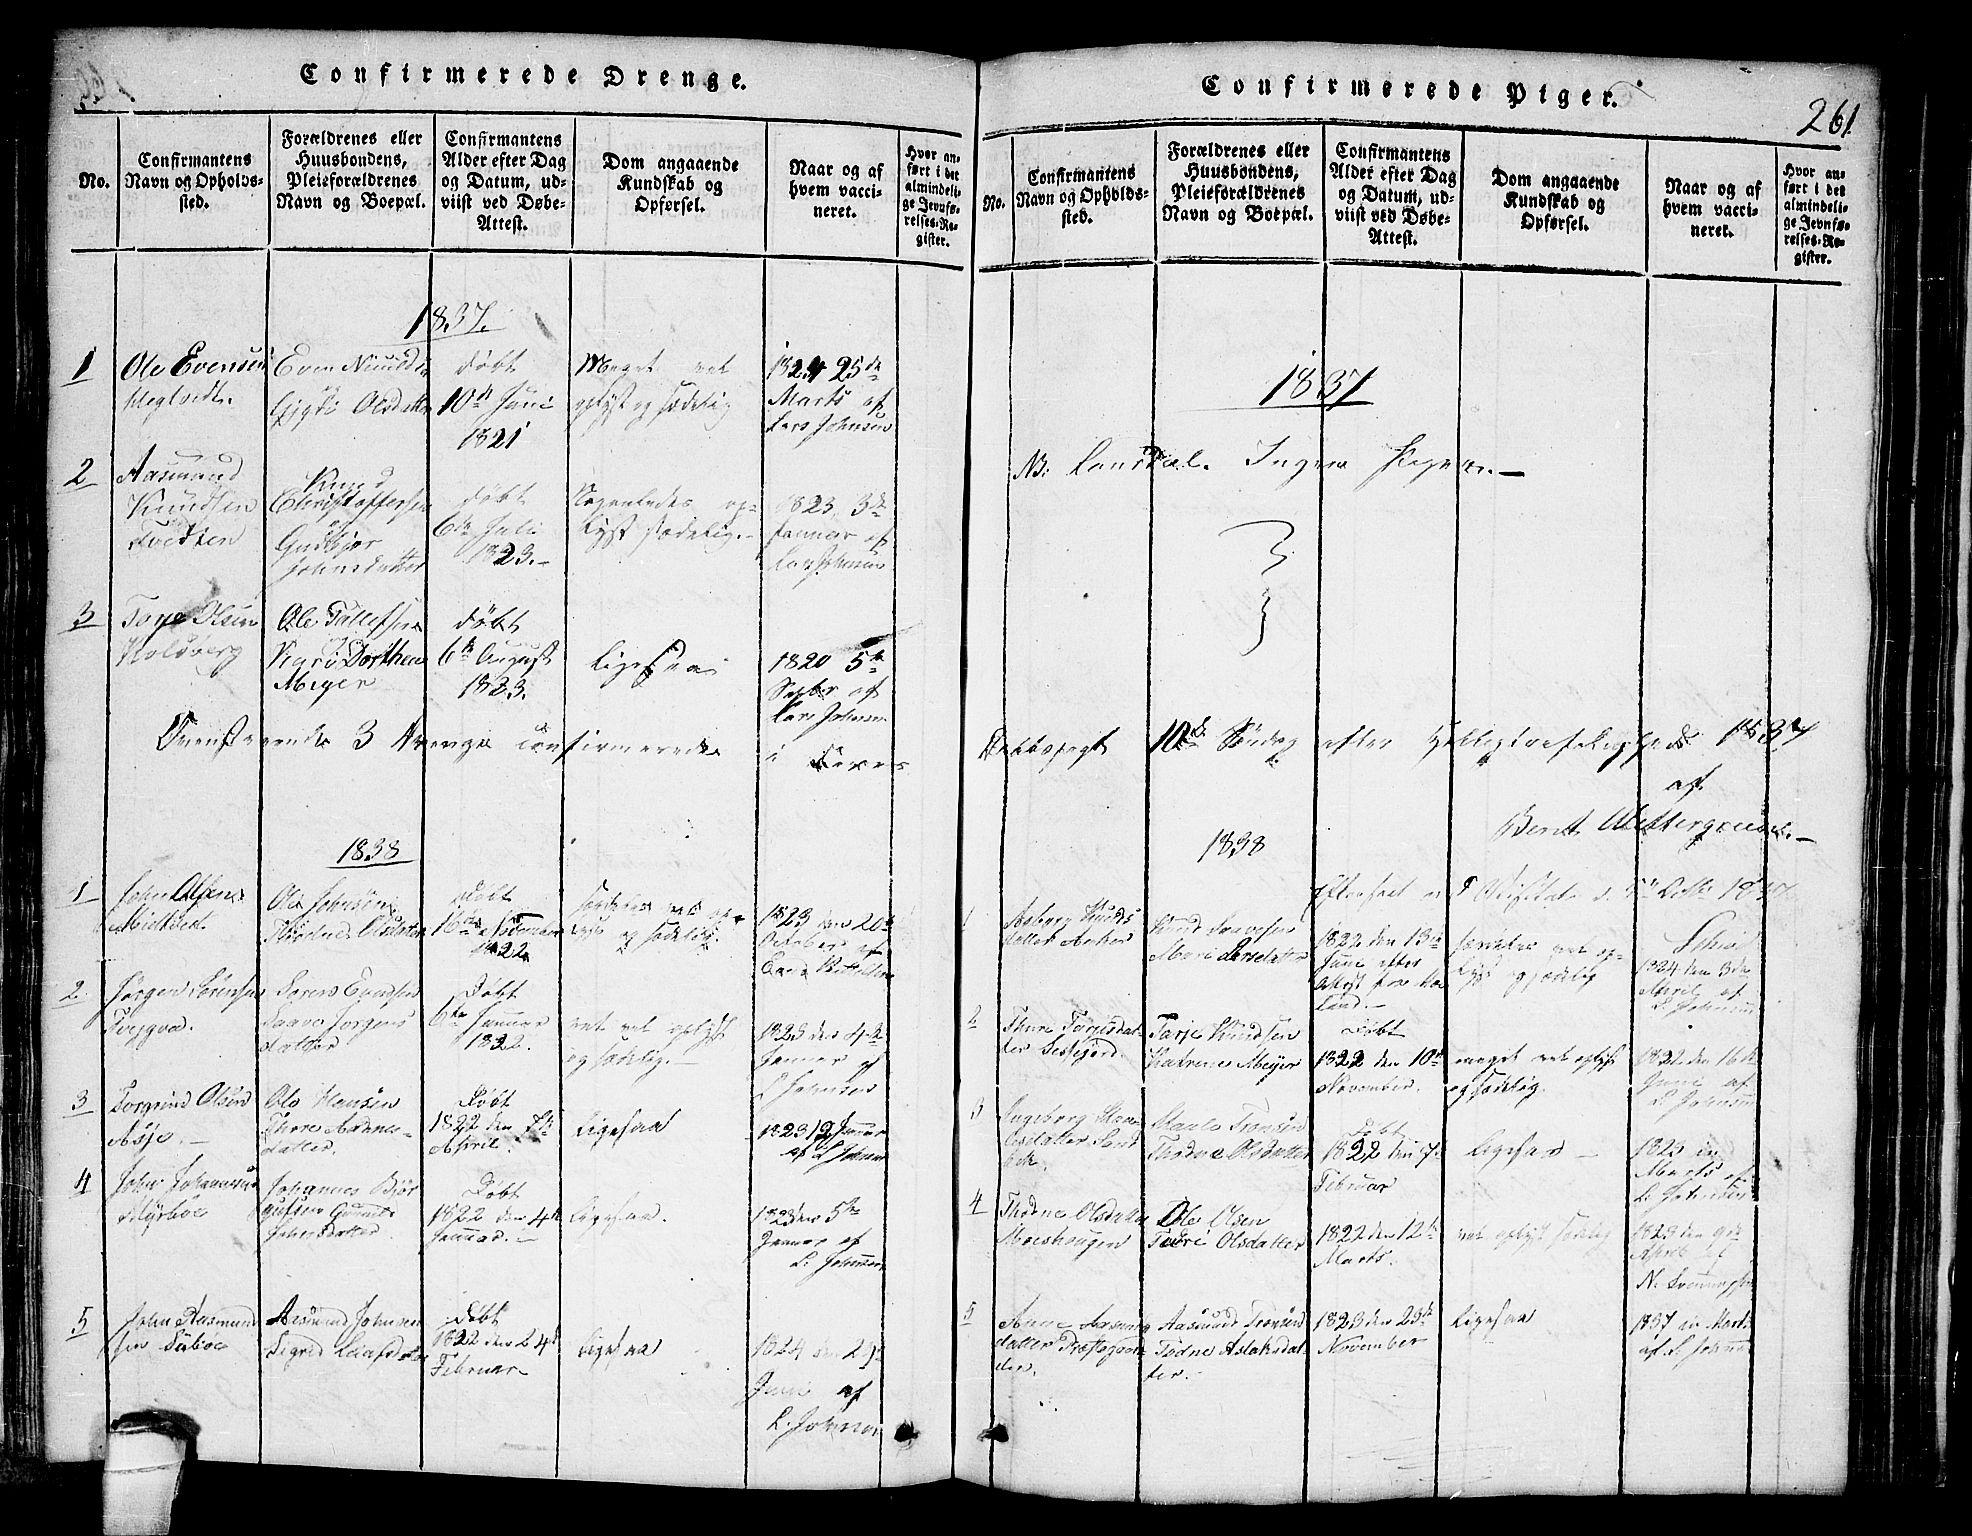 SAKO, Lårdal kirkebøker, G/Ga/L0001: Klokkerbok nr. I 1, 1815-1861, s. 261